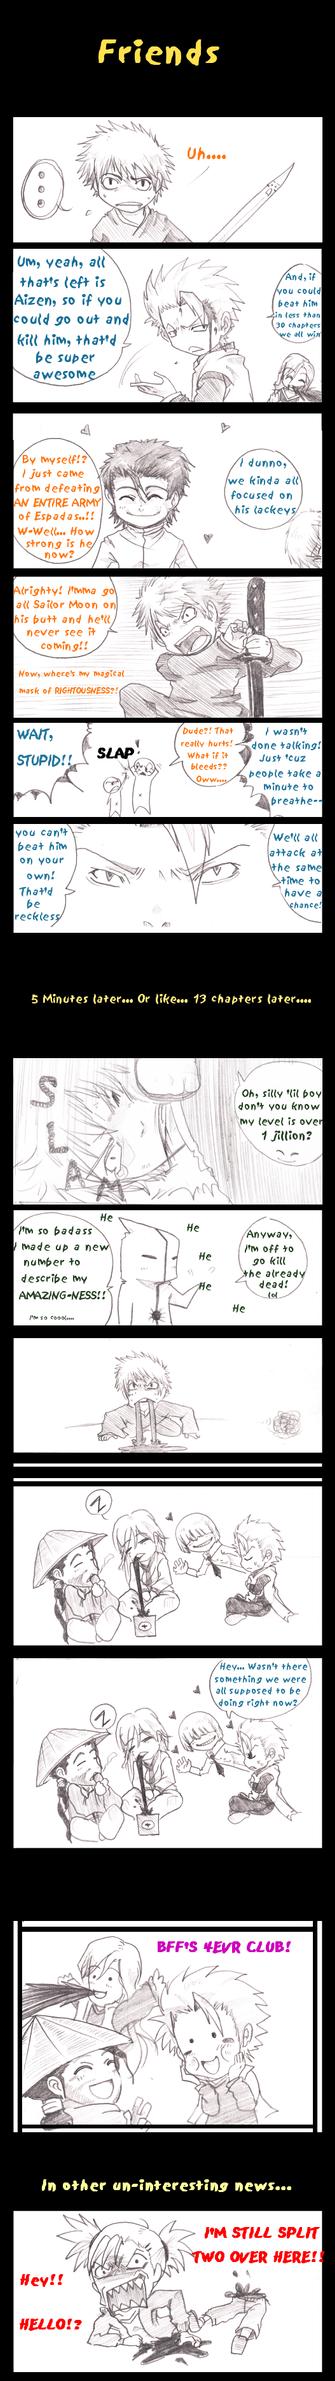 Bleach: Friends by AmukaUroy